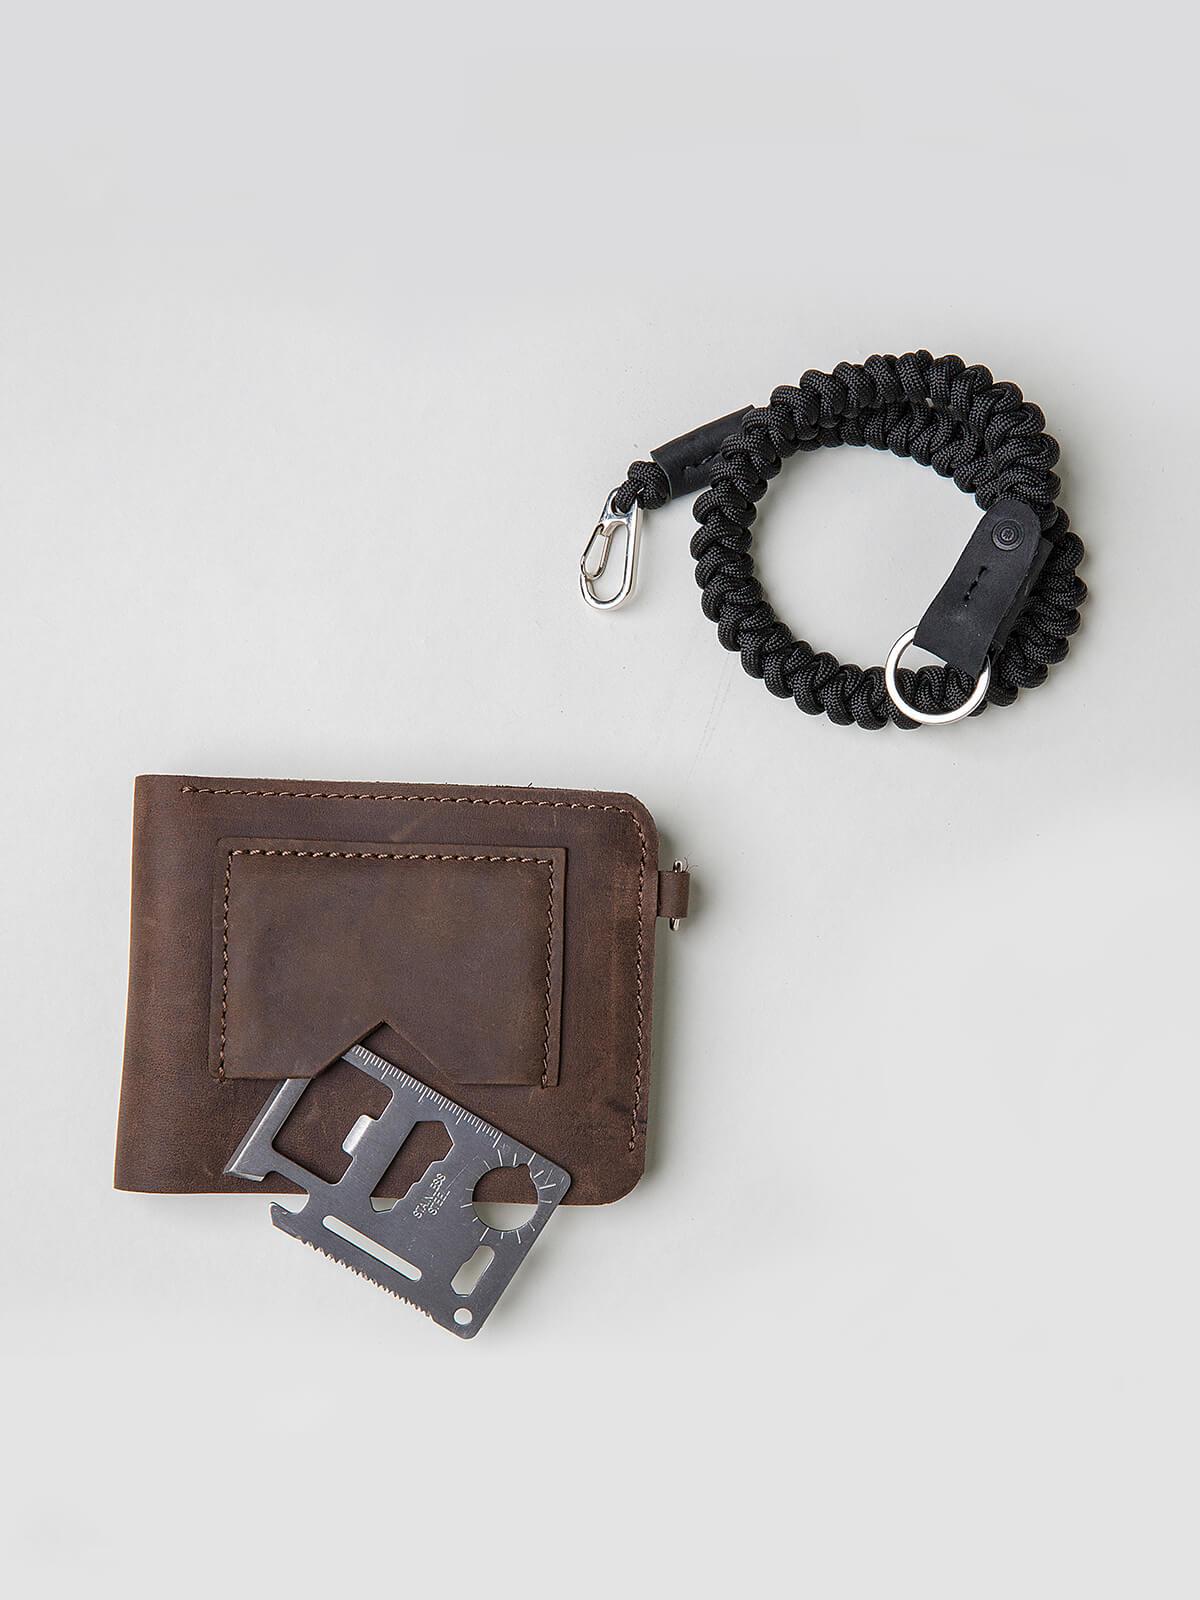 Wallet Roundel. Color brown. 3.